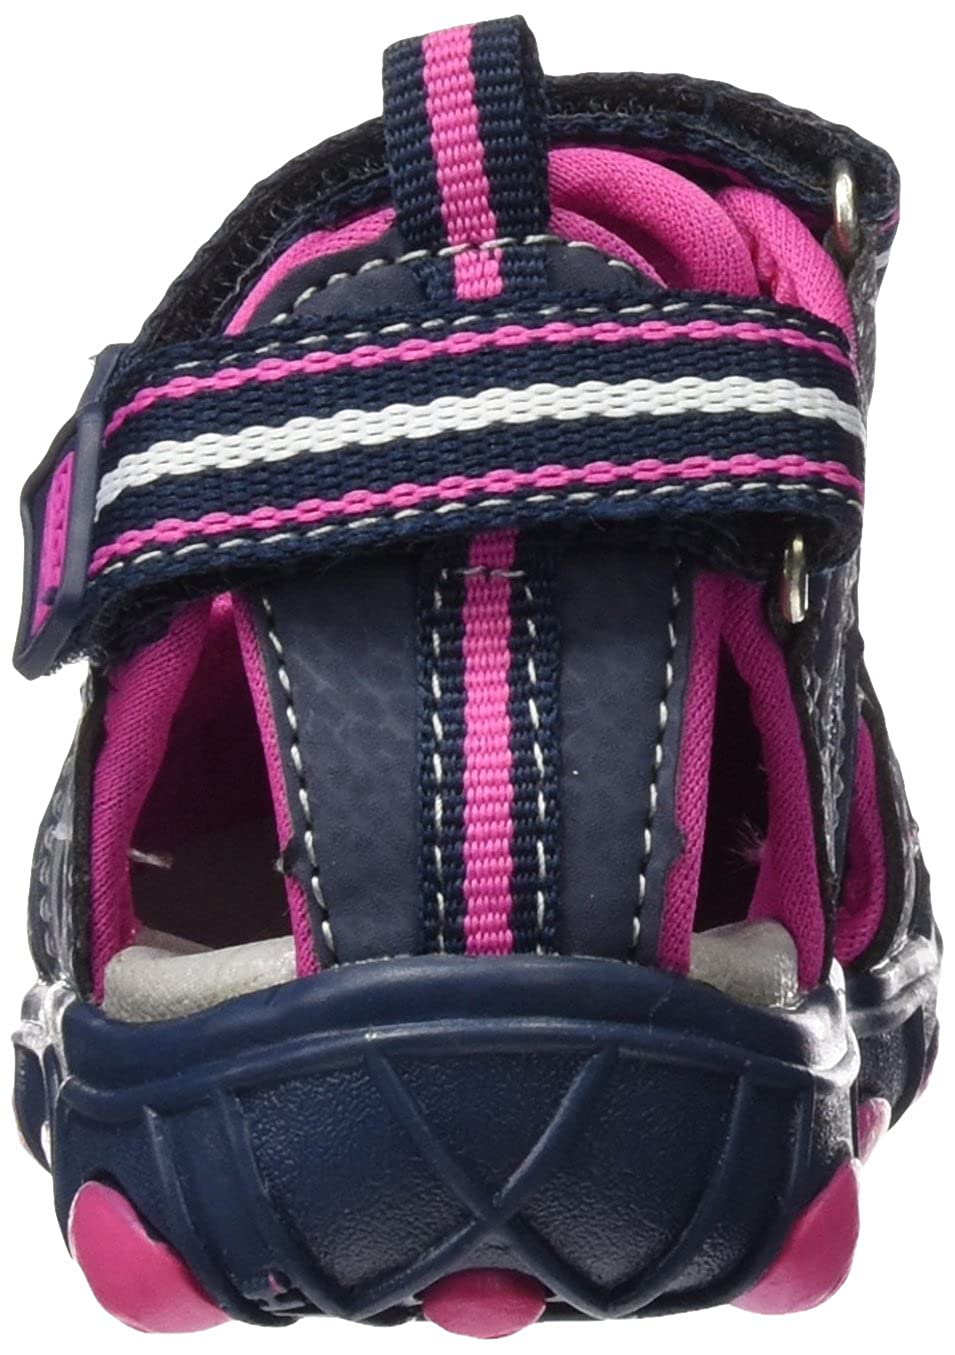 Escarpines Sandalias Para Deportivo Calzado Niñas Sailor Gioseppo f6yb7gY